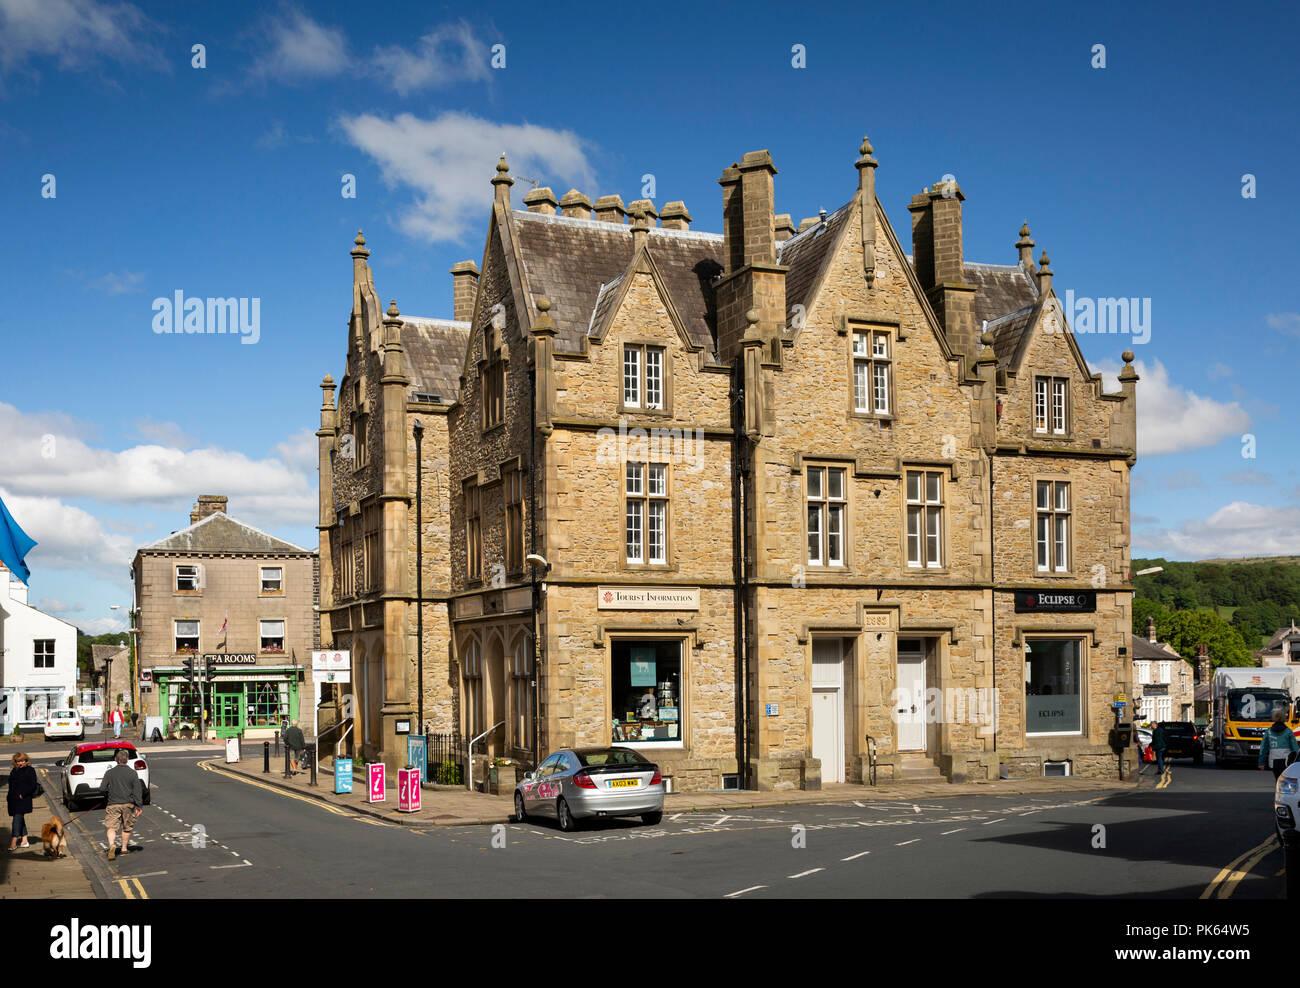 5 Bedroom Detached For Sale on Settle North Yorkshire